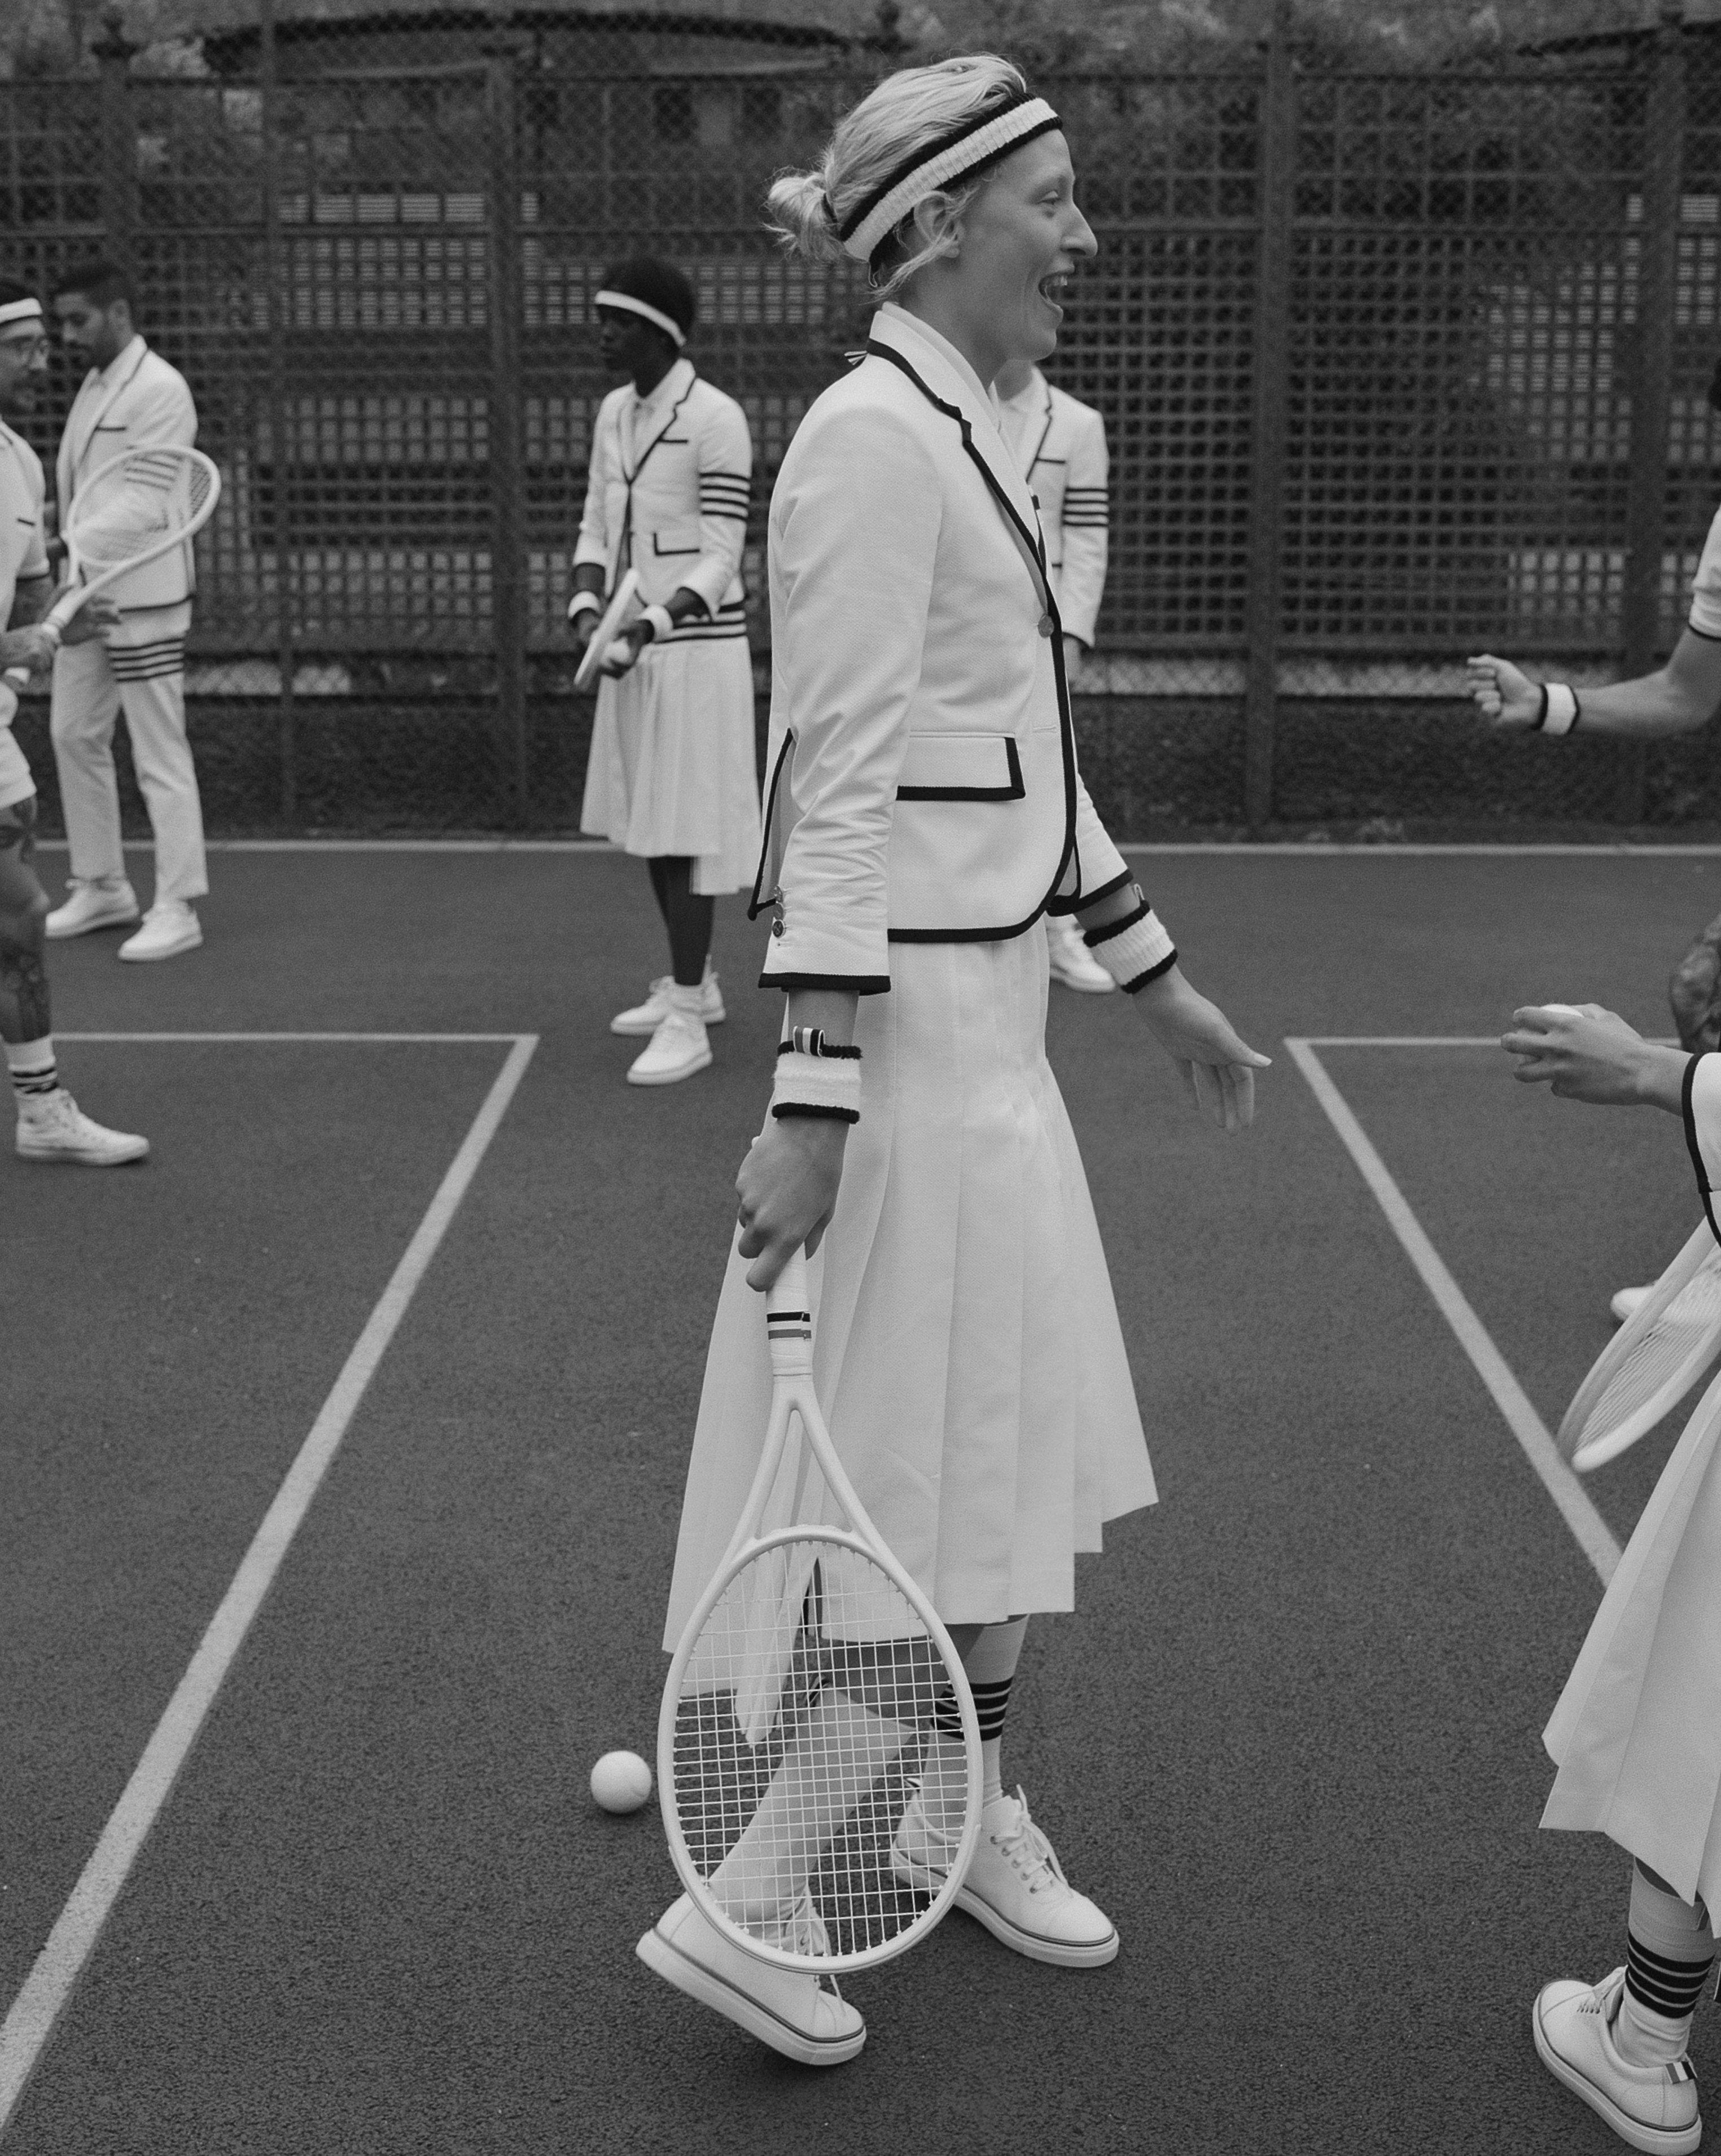 Thom Browne Designs Tennis Whites for Wimbledon 2017